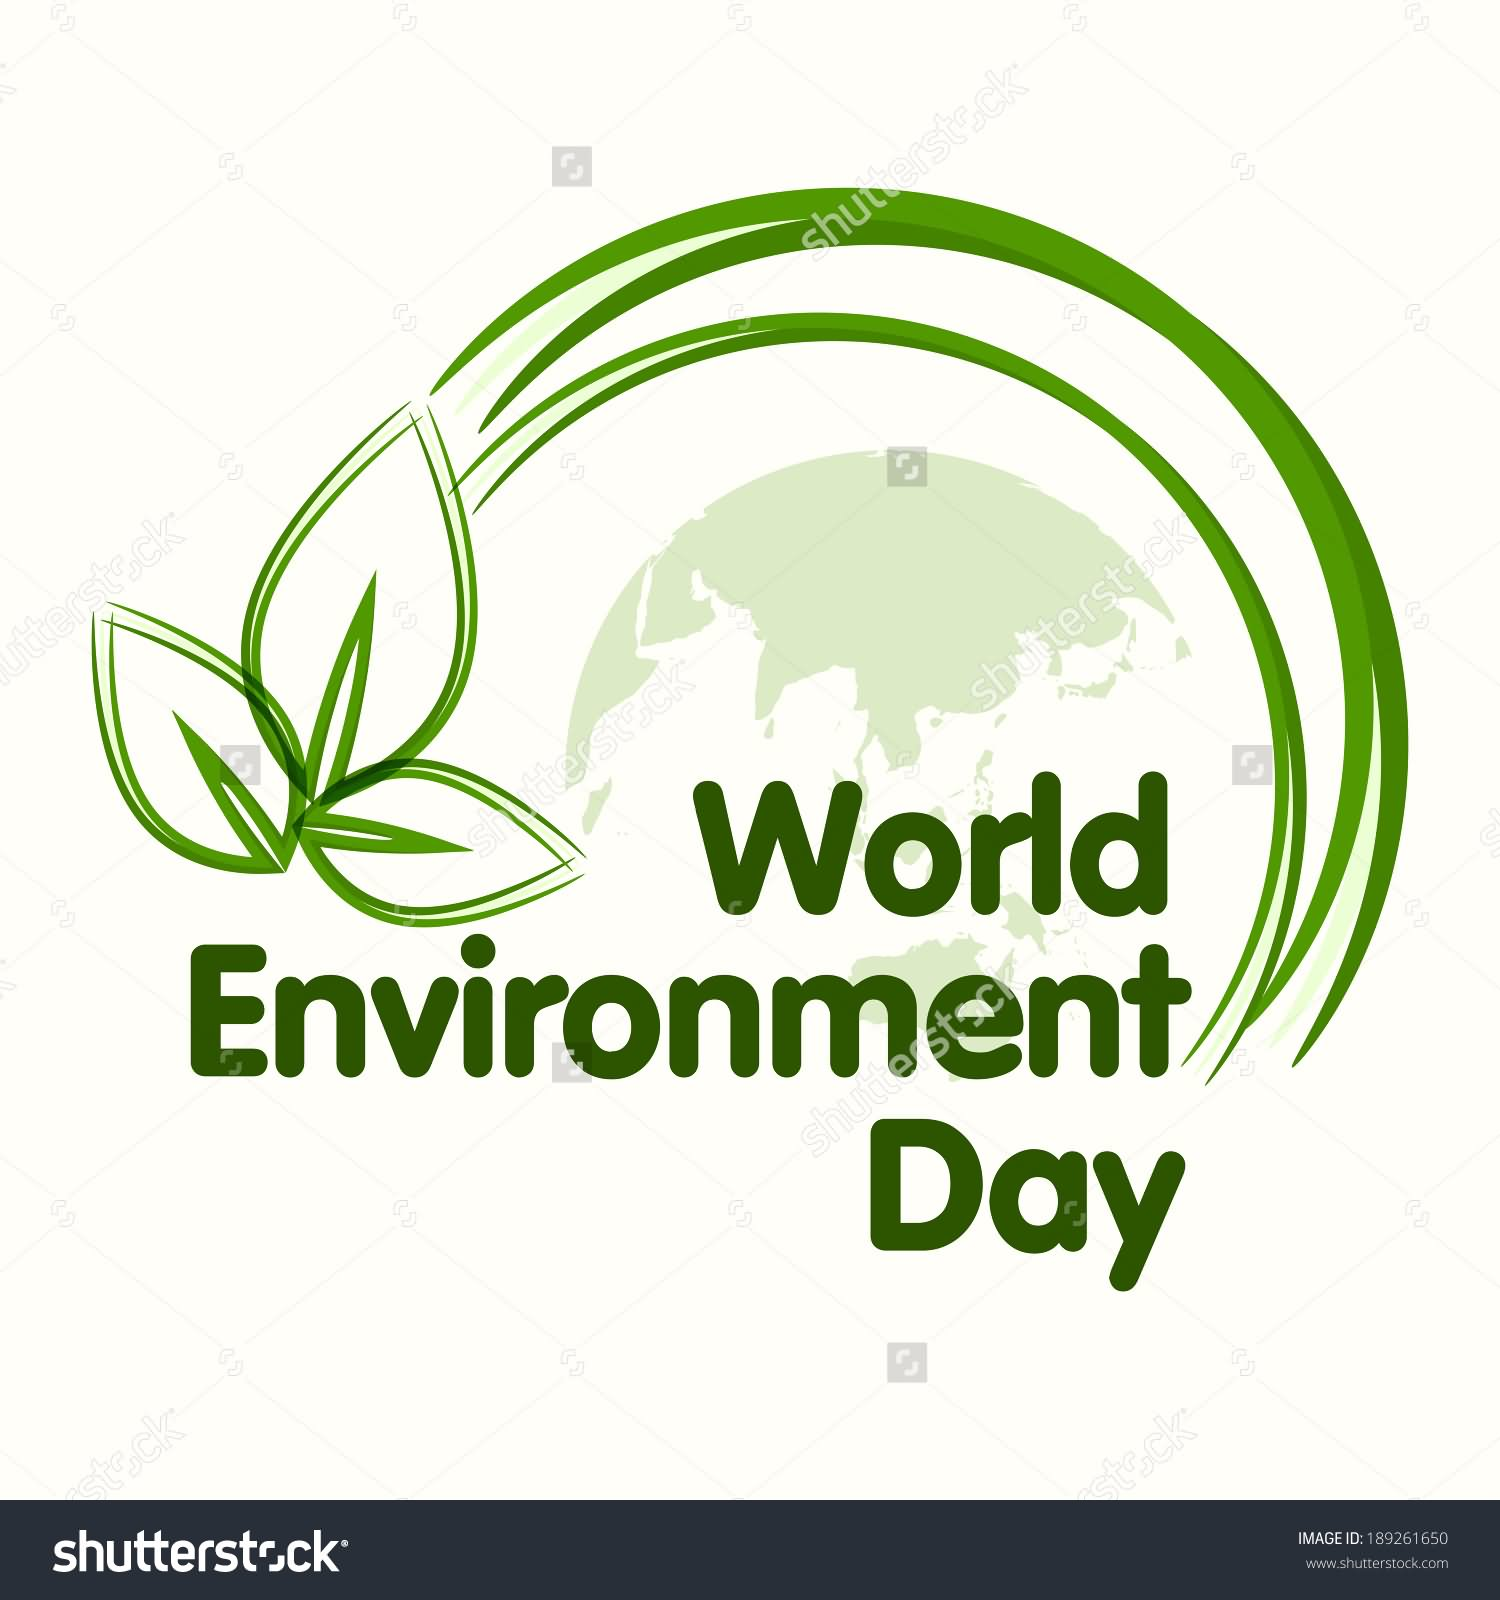 40 Most Wonderful World Environment Day